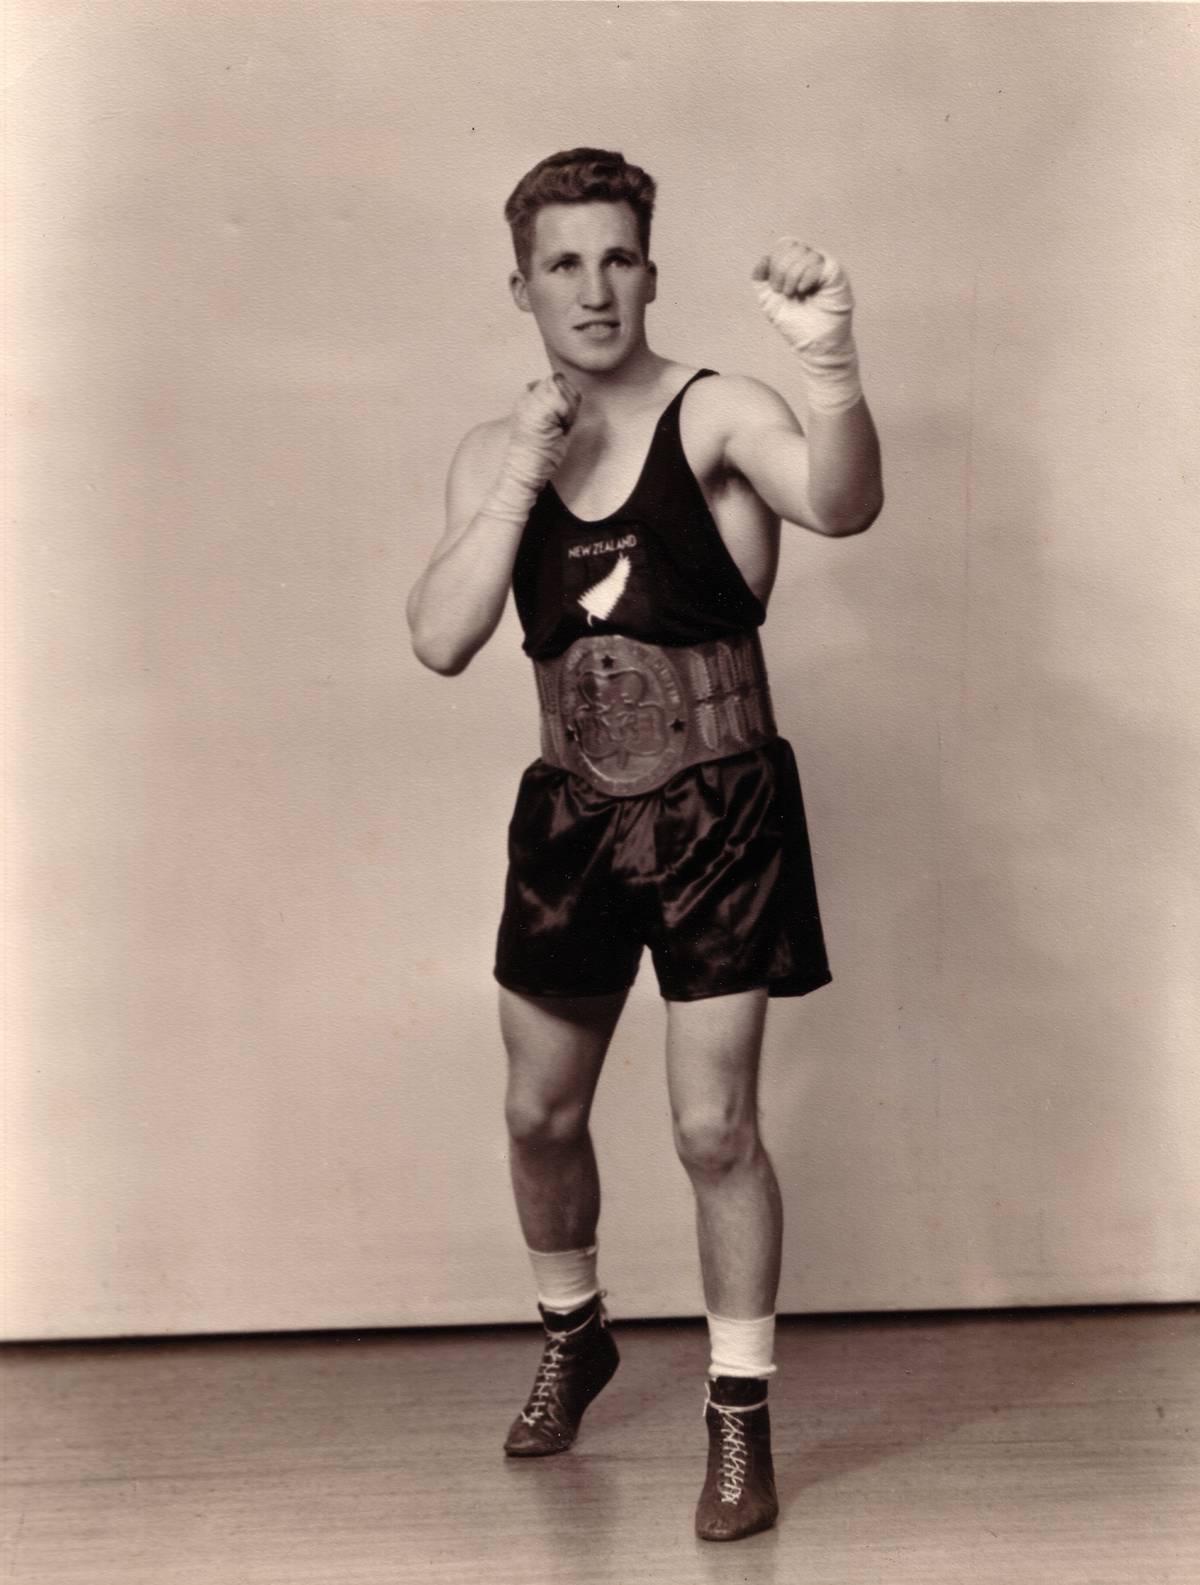 Olympics boxer Paddy Donovan dies in Napier